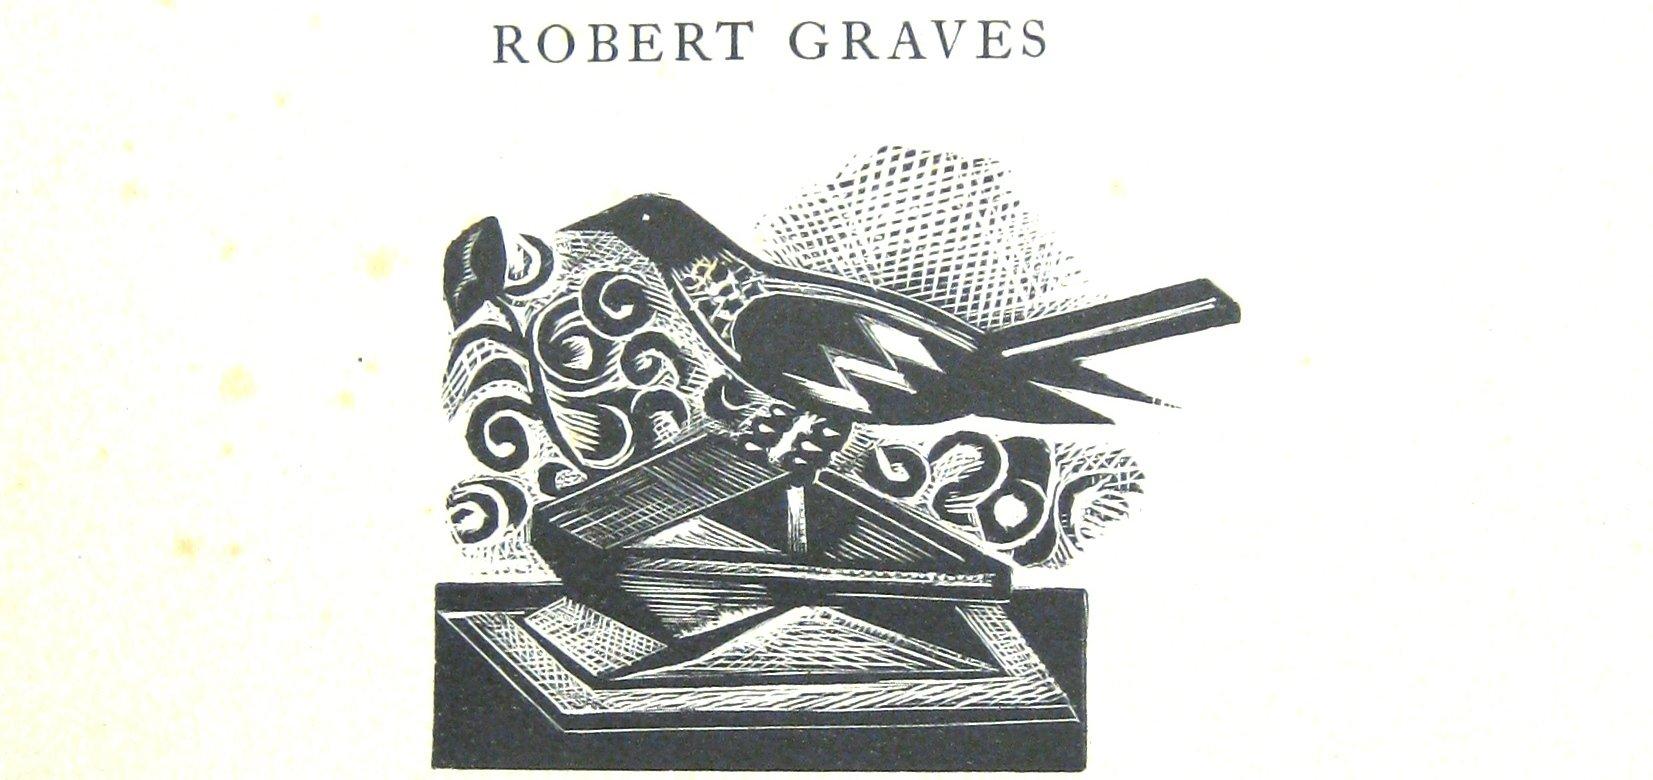 Welchman's Hose by Robert Graves